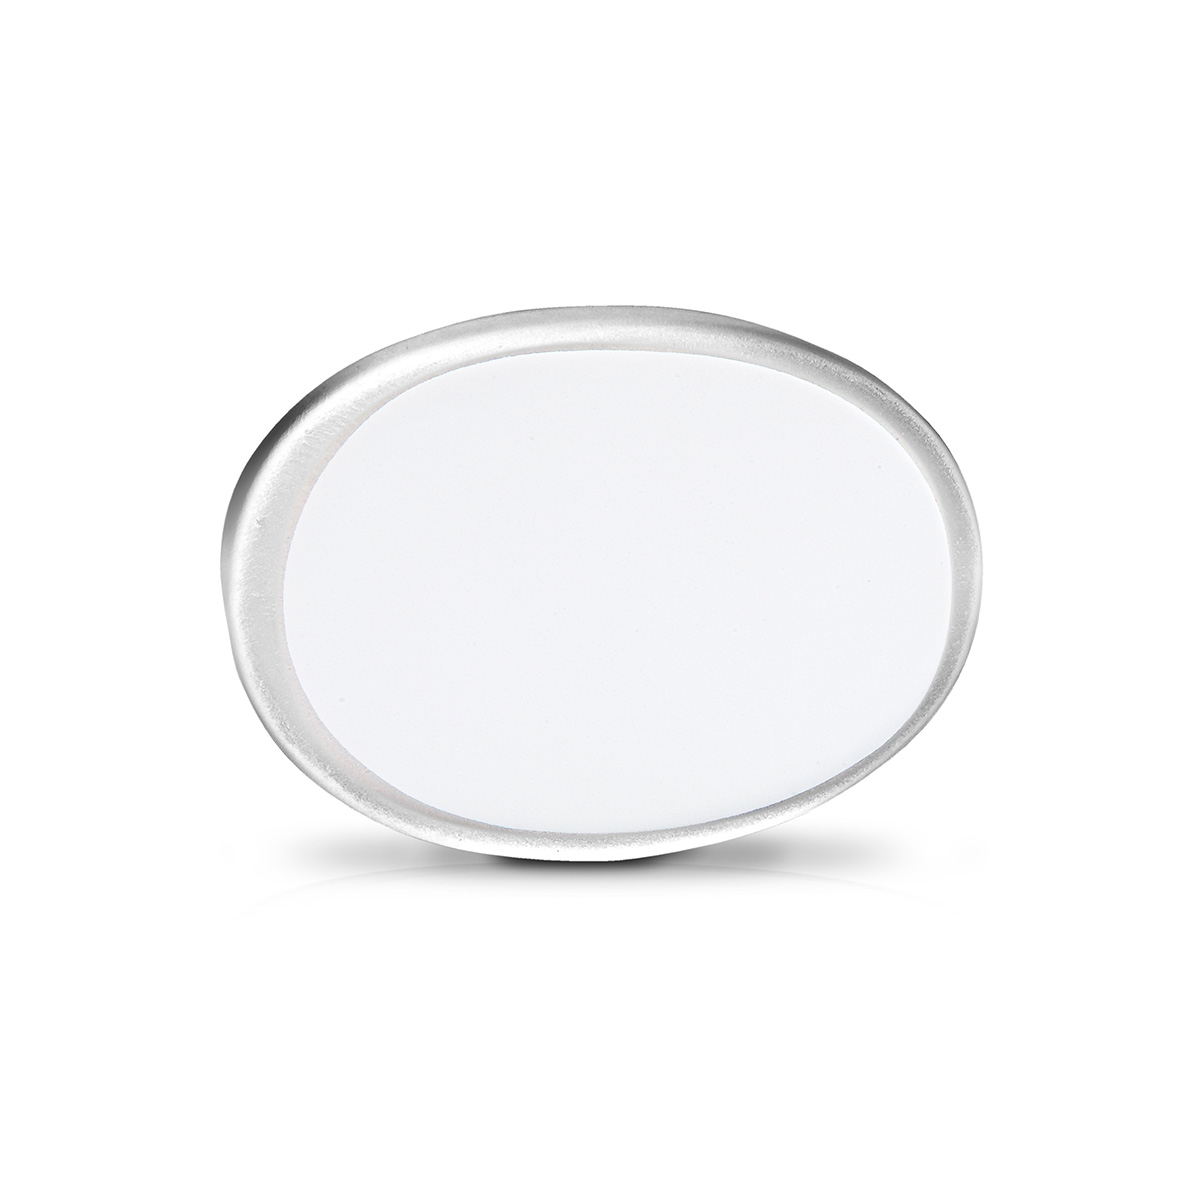 Abajur Brent 32cm Base Ceramica Branca E-27 Max 40w Cupula Tecido Branco